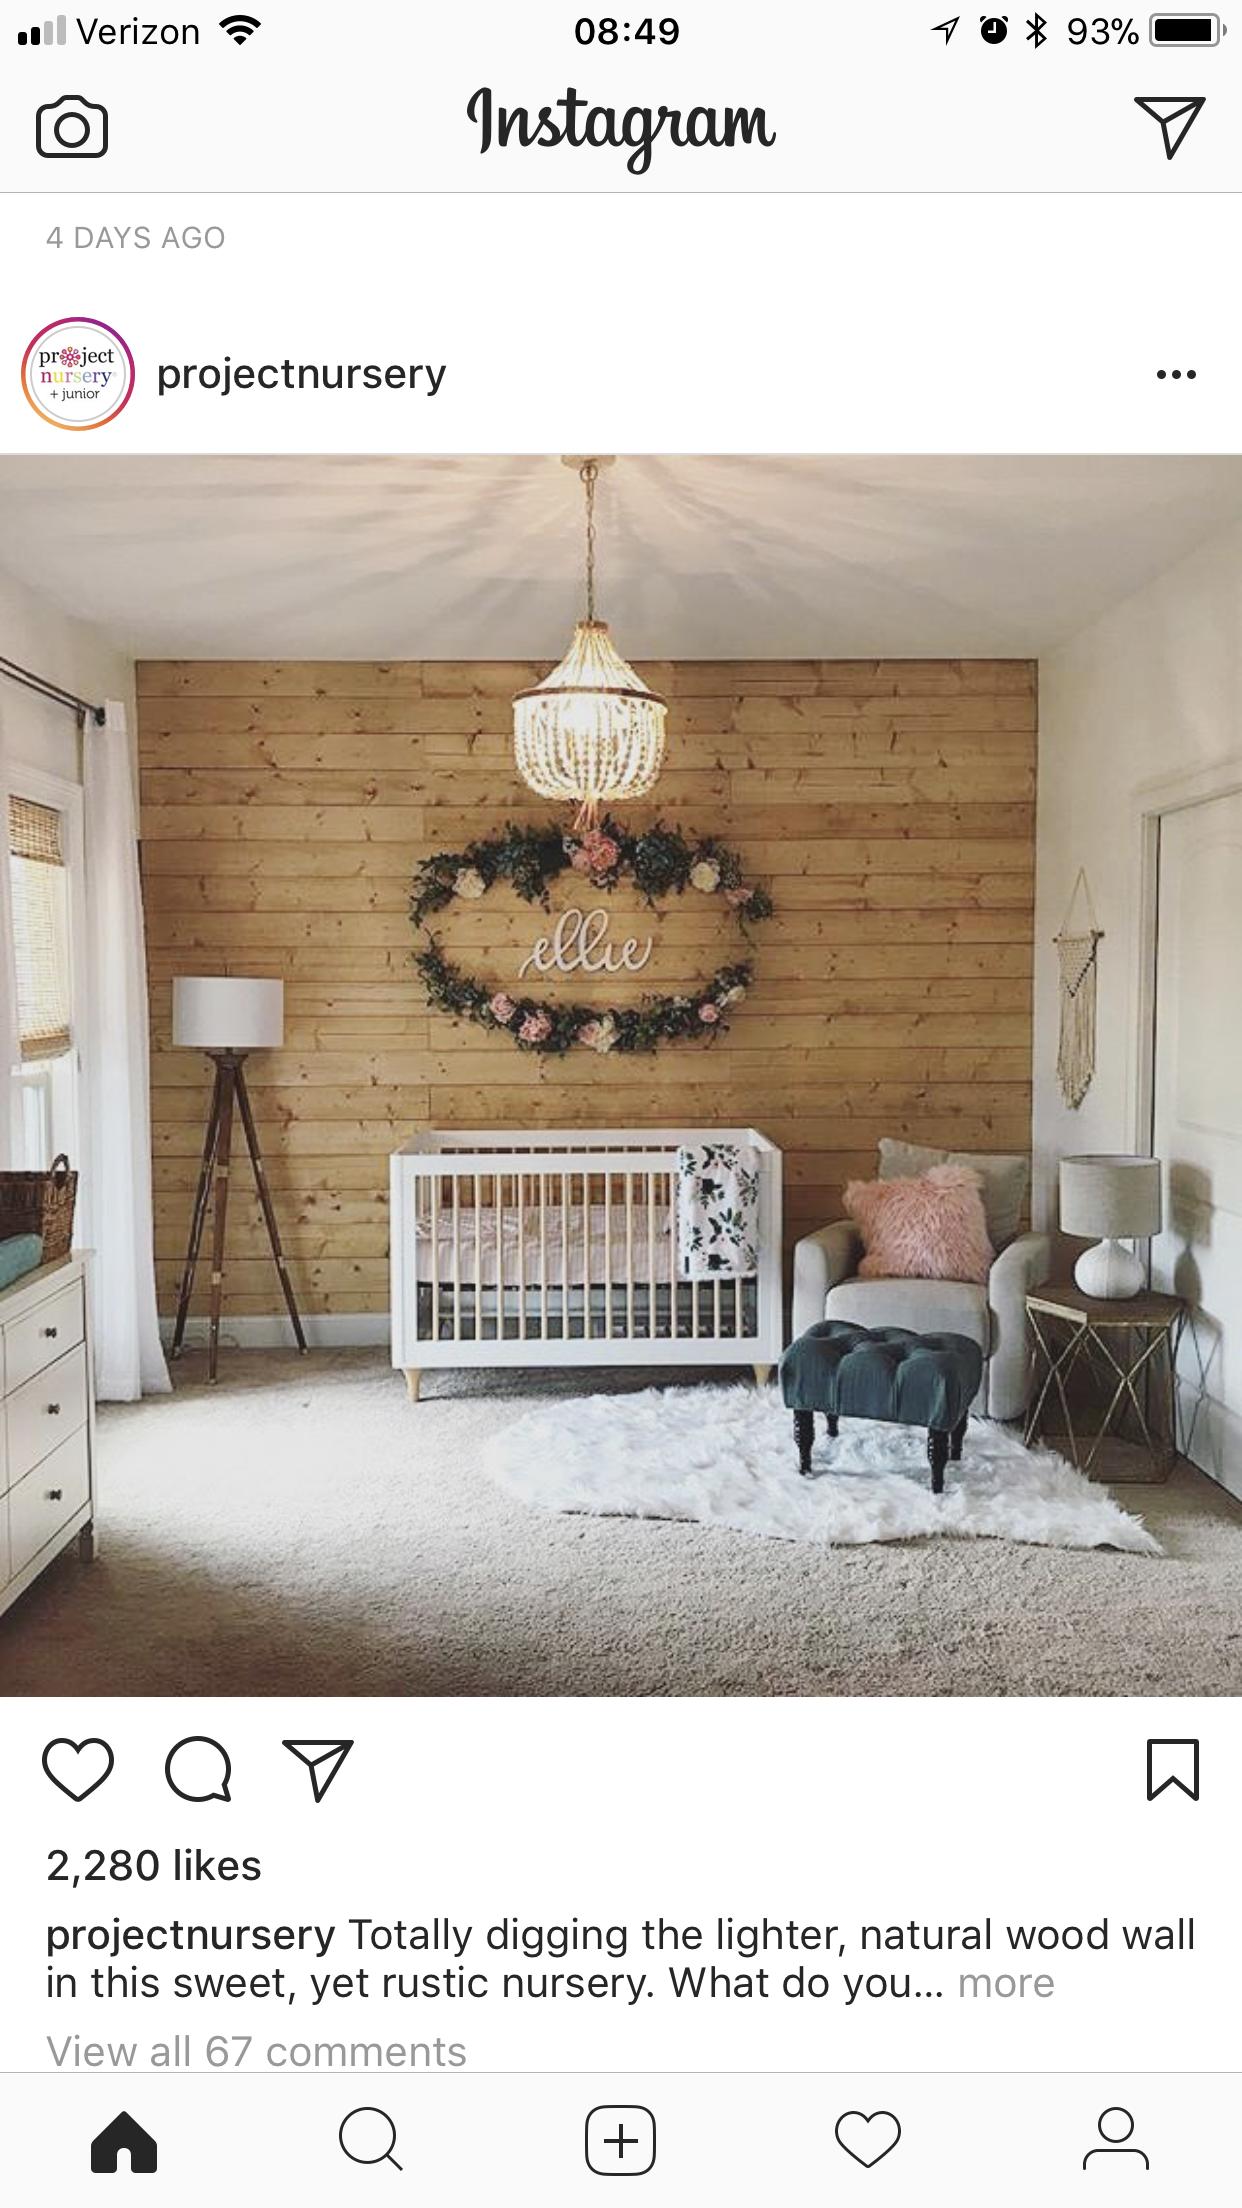 accent wall + chandelier + neautrals but pops of colour = gorgeous ...